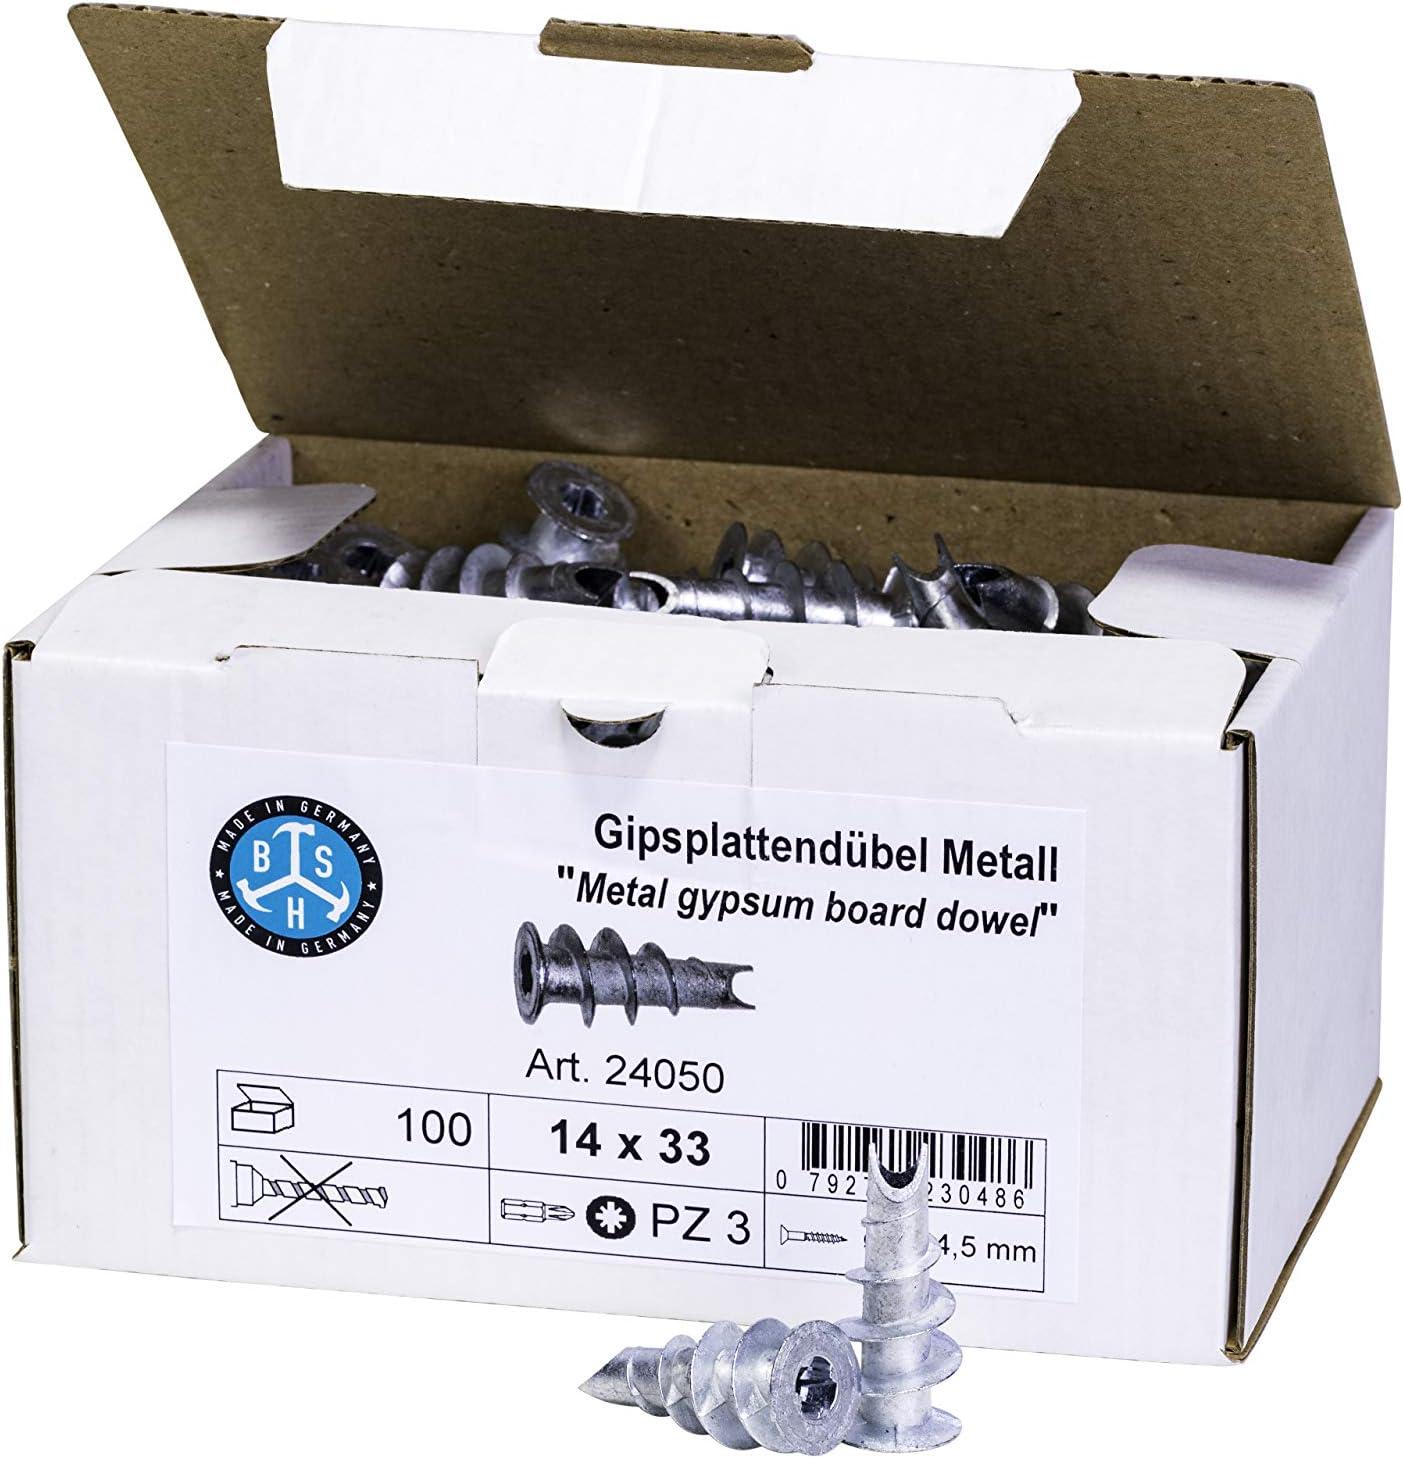 Gipskartondübel BSH® Gipsplattendübel Metall oder Kunststoff 100 St.// Paket